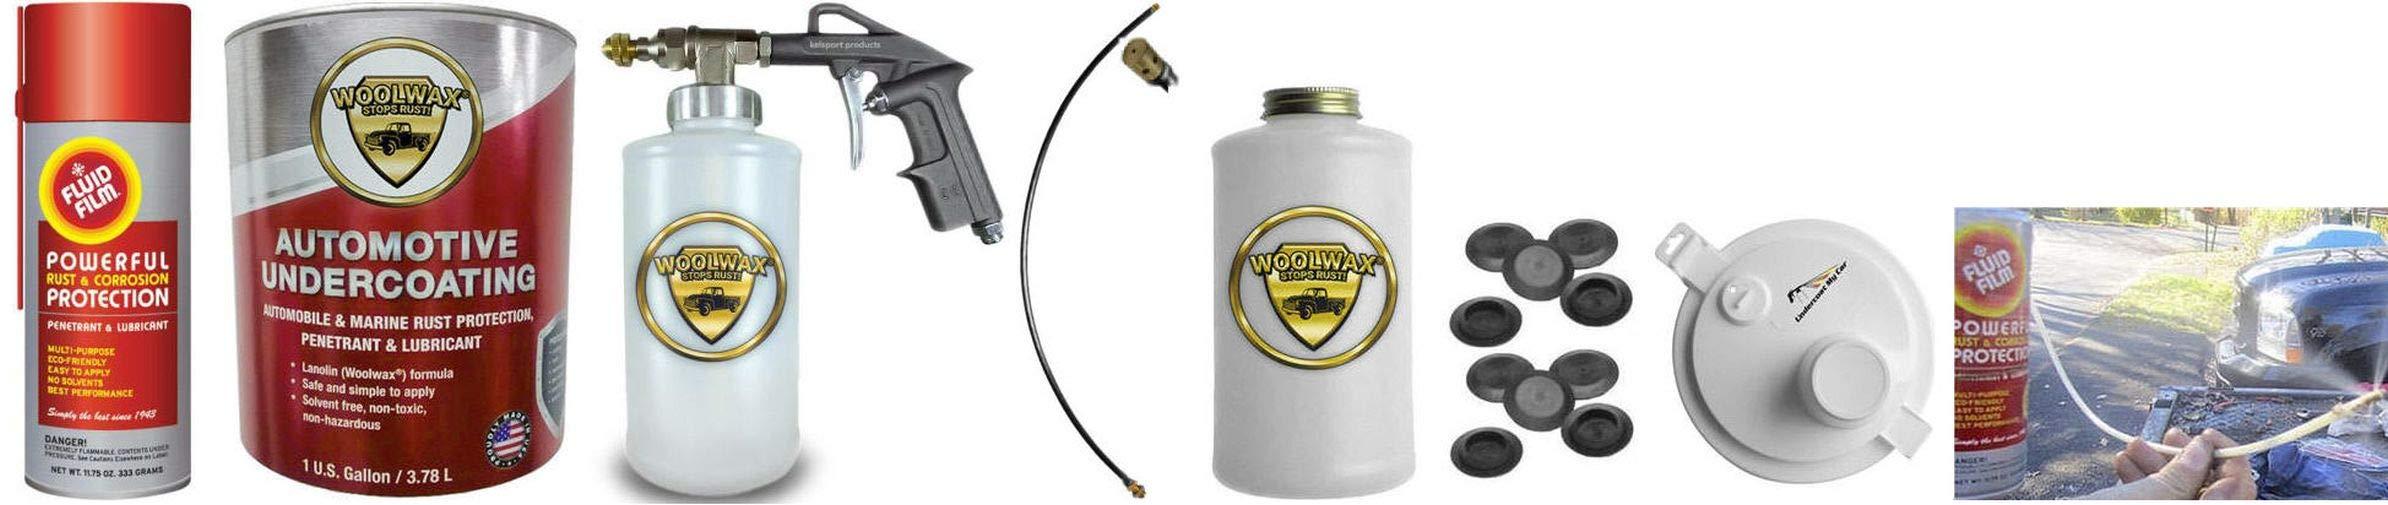 Fluid Film & Woolwax 1 Gallon Undercoating Kit Bundle w/PRO Gun. Black Color.